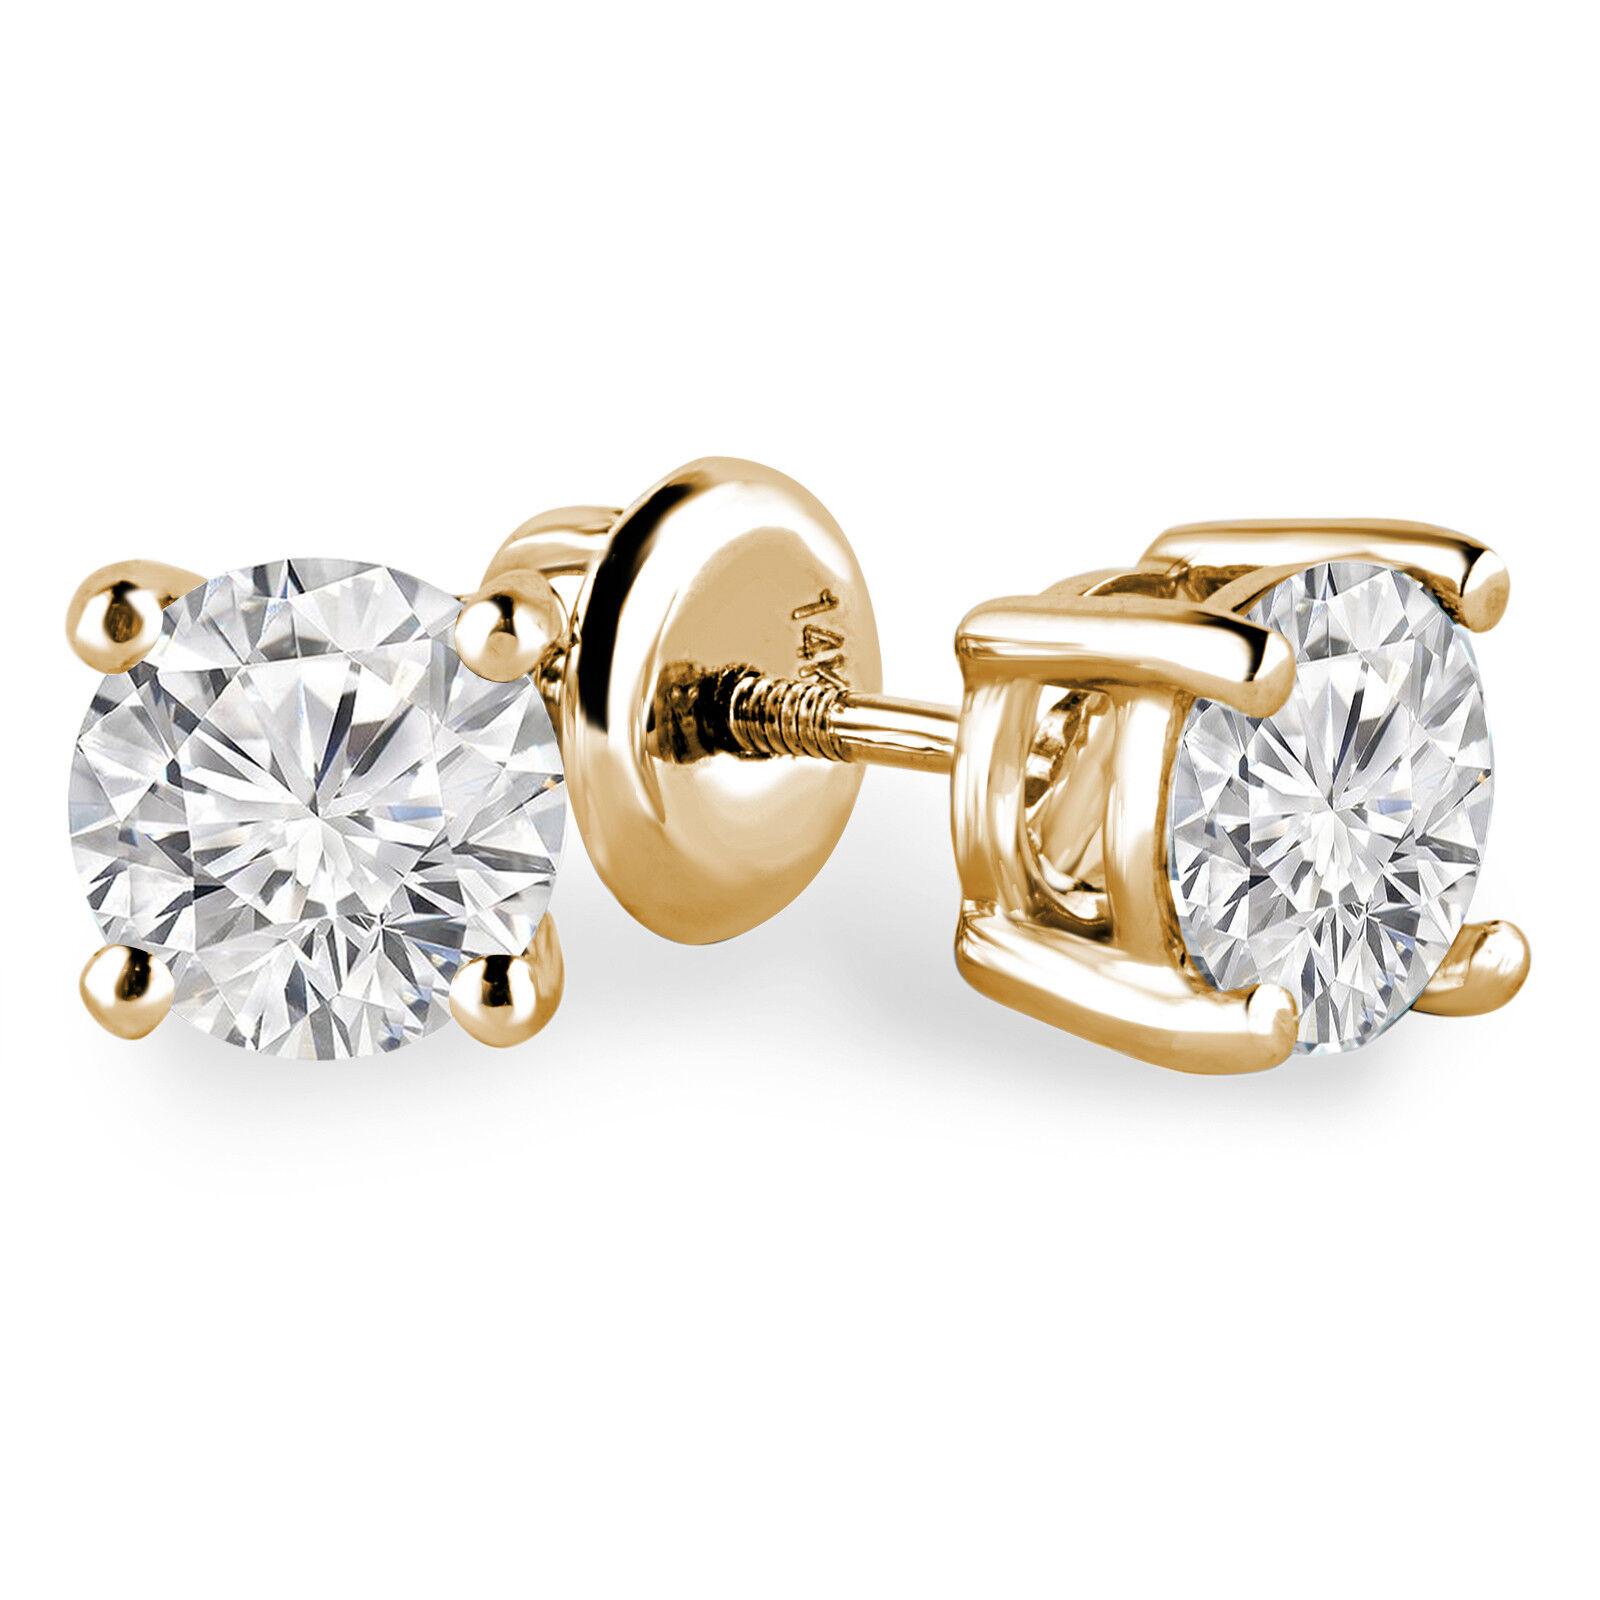 .32 CTW VS2 G ROUND DIAMOND STUD EARRINGS 14K YELLOW gold